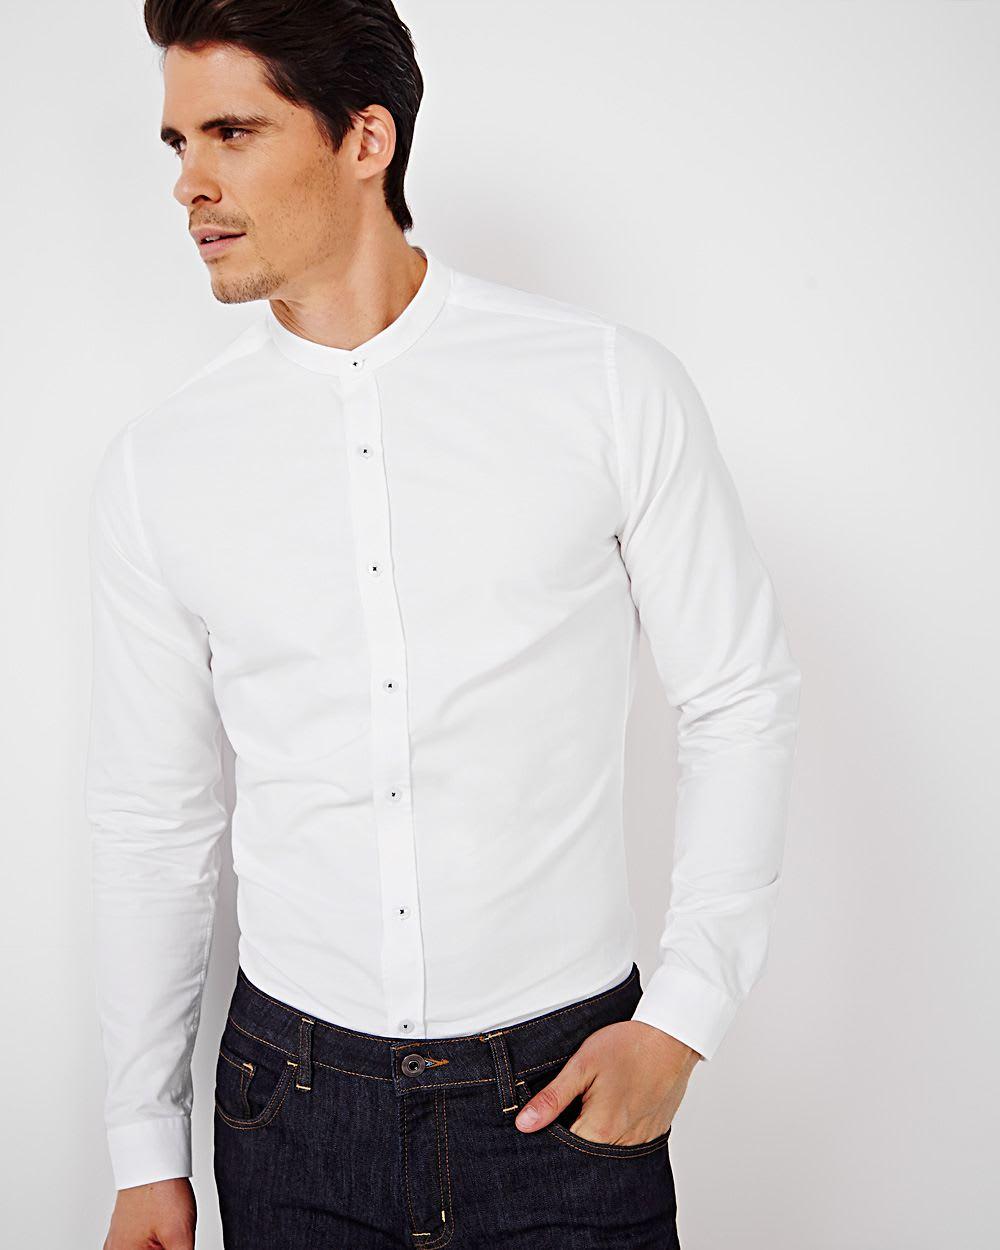 Slim fit mandarin collar dress shirt rw co for Dress shirt collar fit